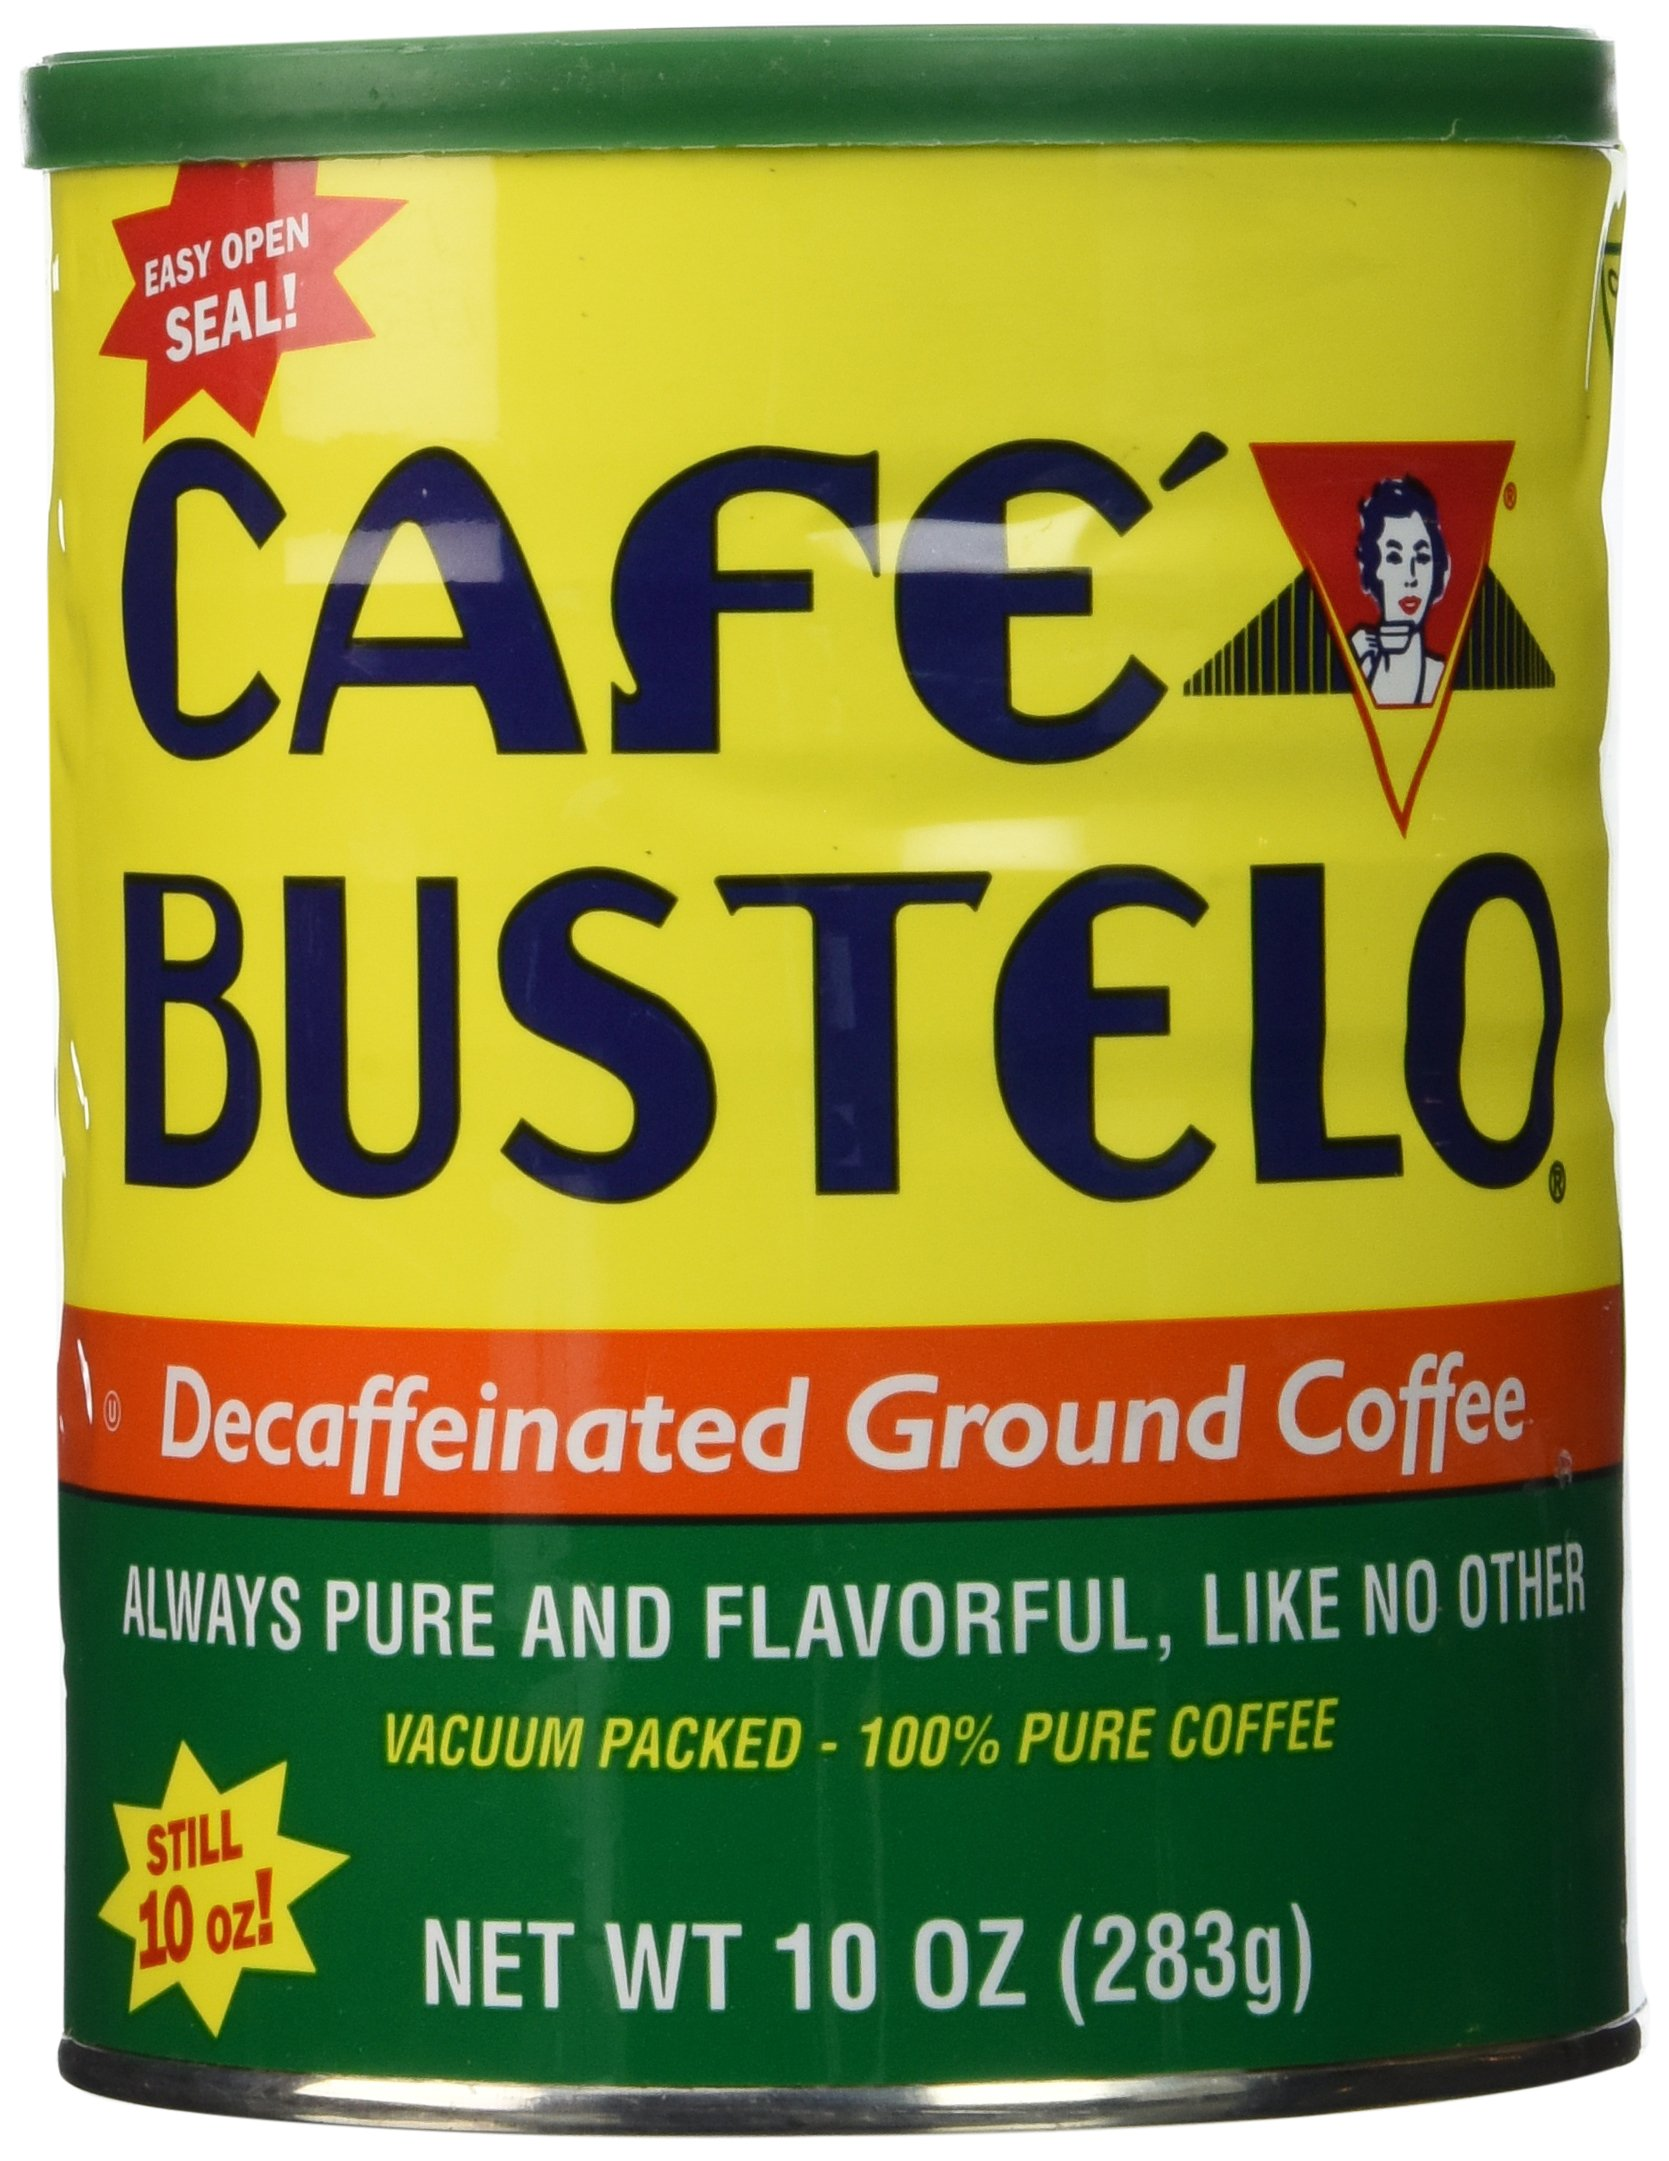 Cafe Bustelo Decaffeinated Coffee, 10 oz